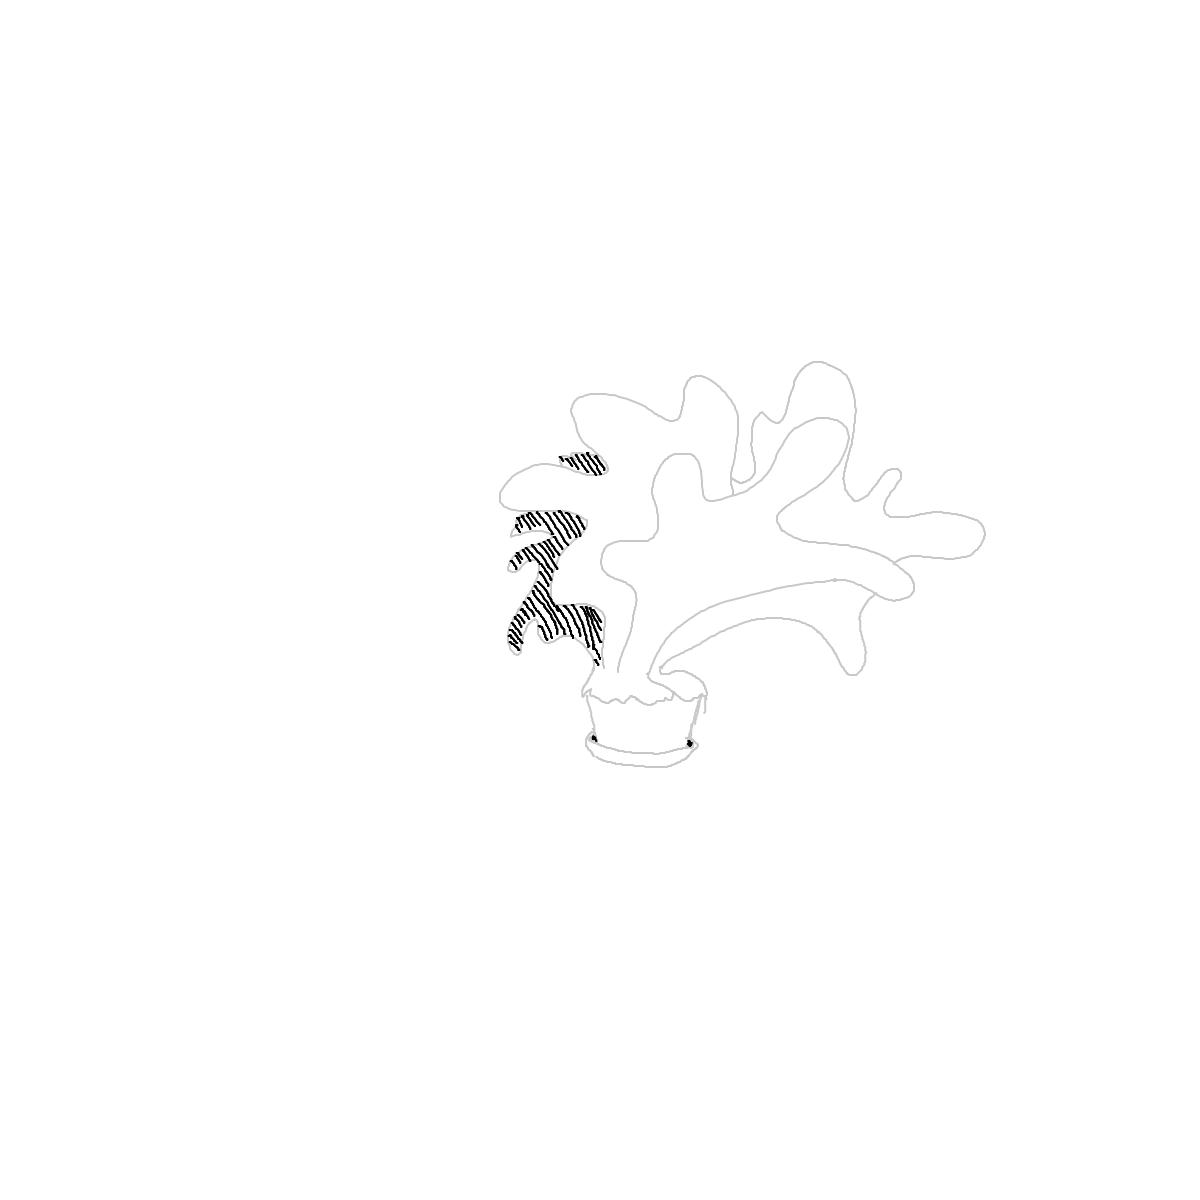 BAAAM drawing#8860 lat:52.0876083374023440lng: 4.3381934165954590